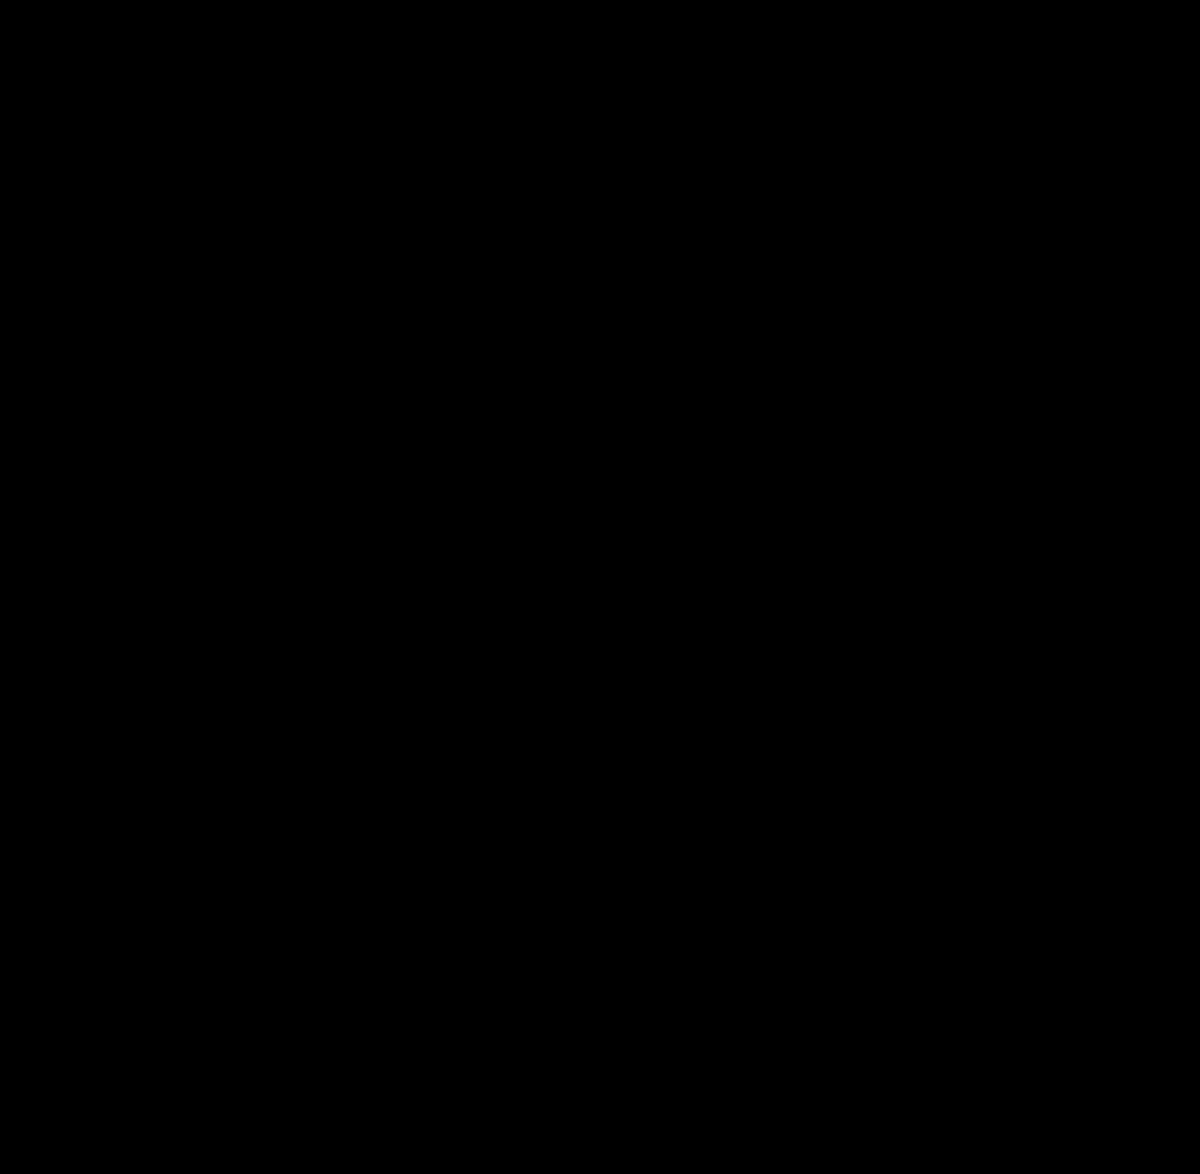 f:id:TETSUGAKUMAN:20210222165018p:plain